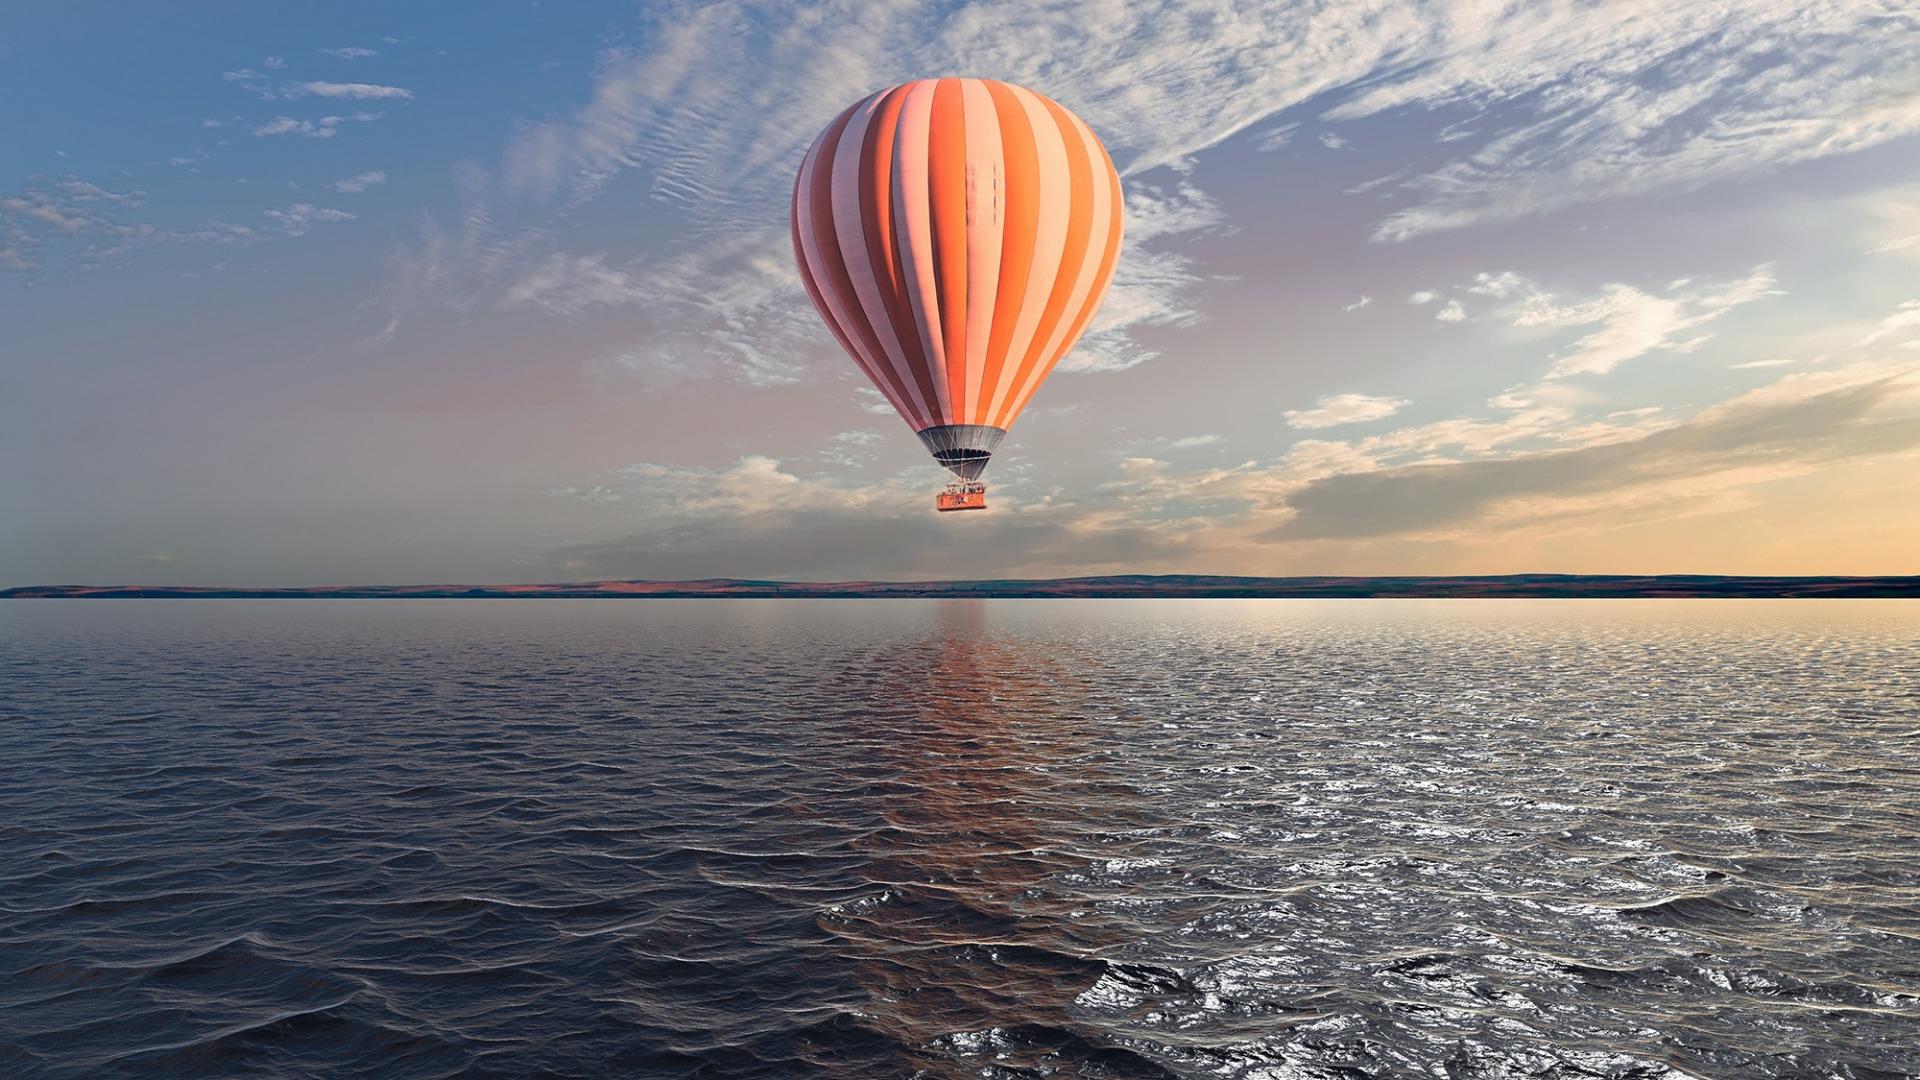 Air Balloon wallpaper for computer